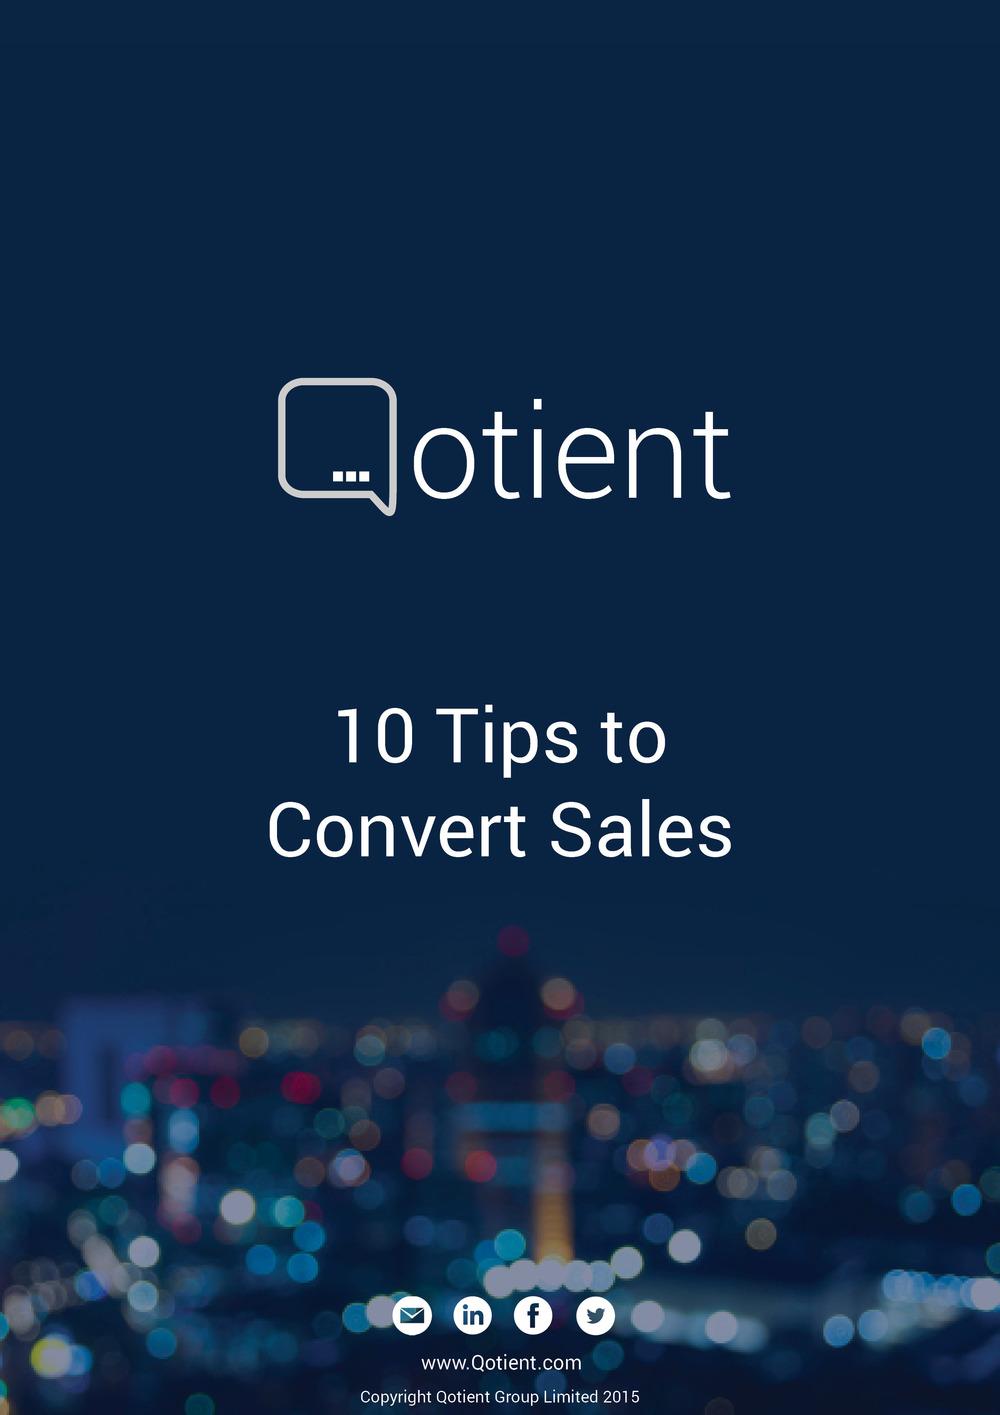 Convert Sales